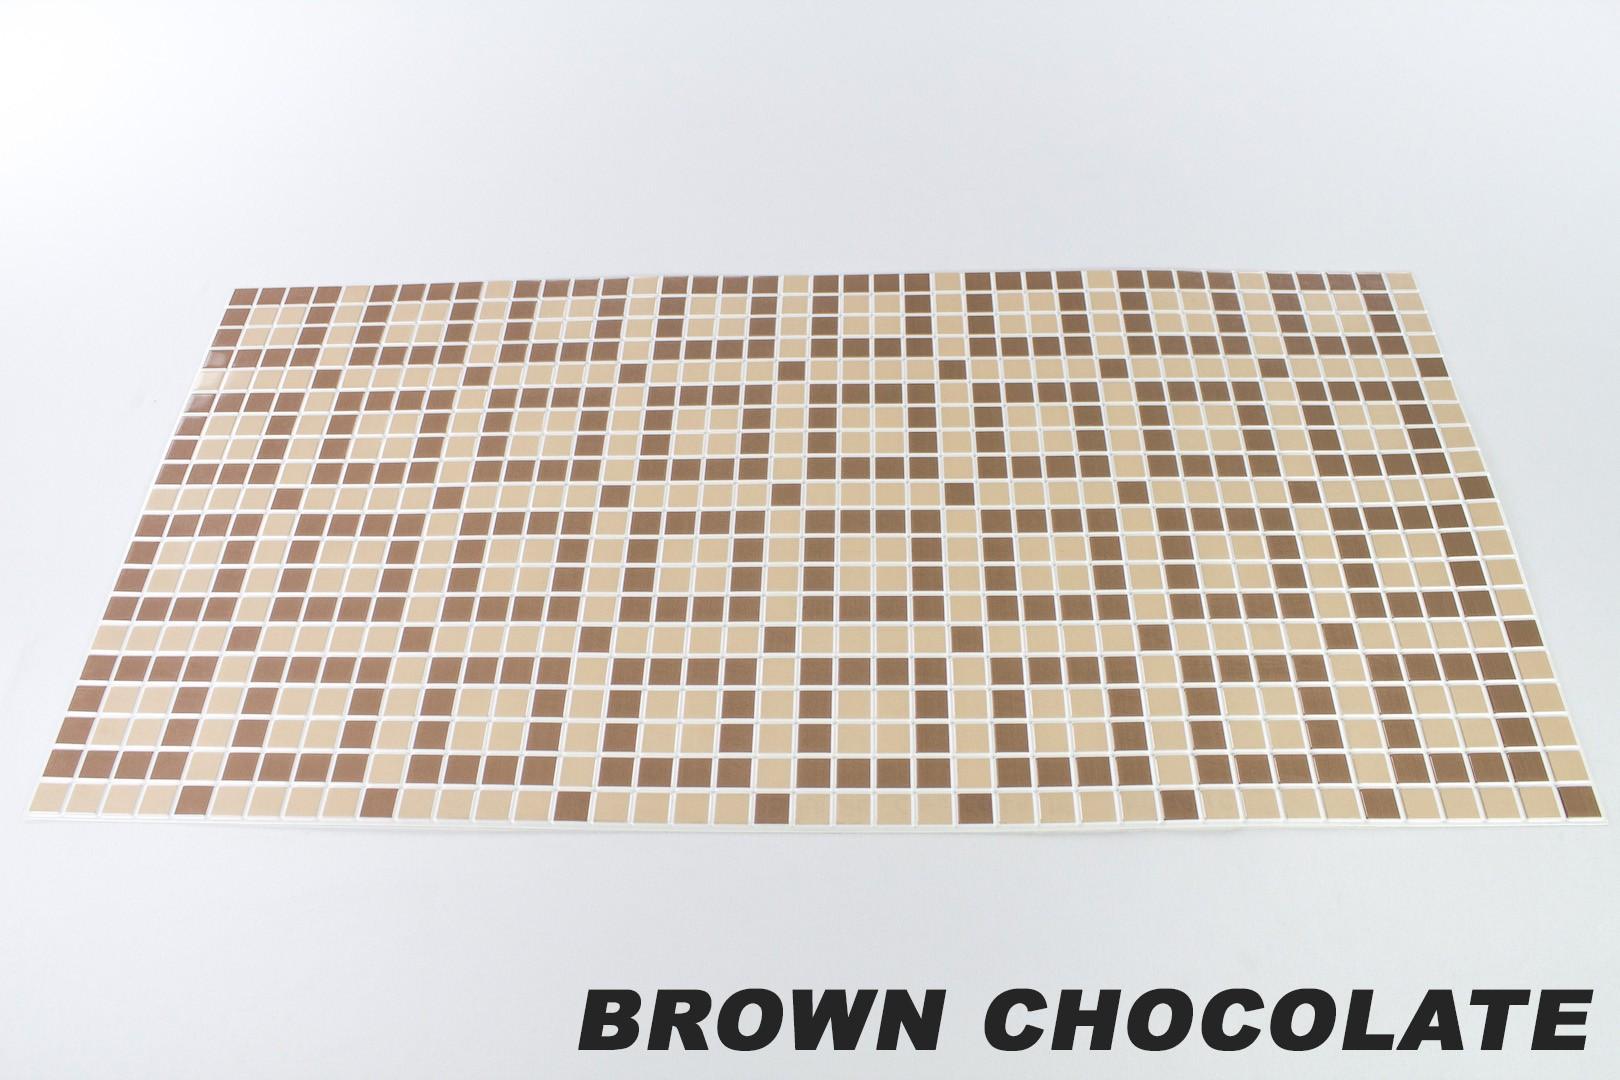 Brown chocolate originalbild